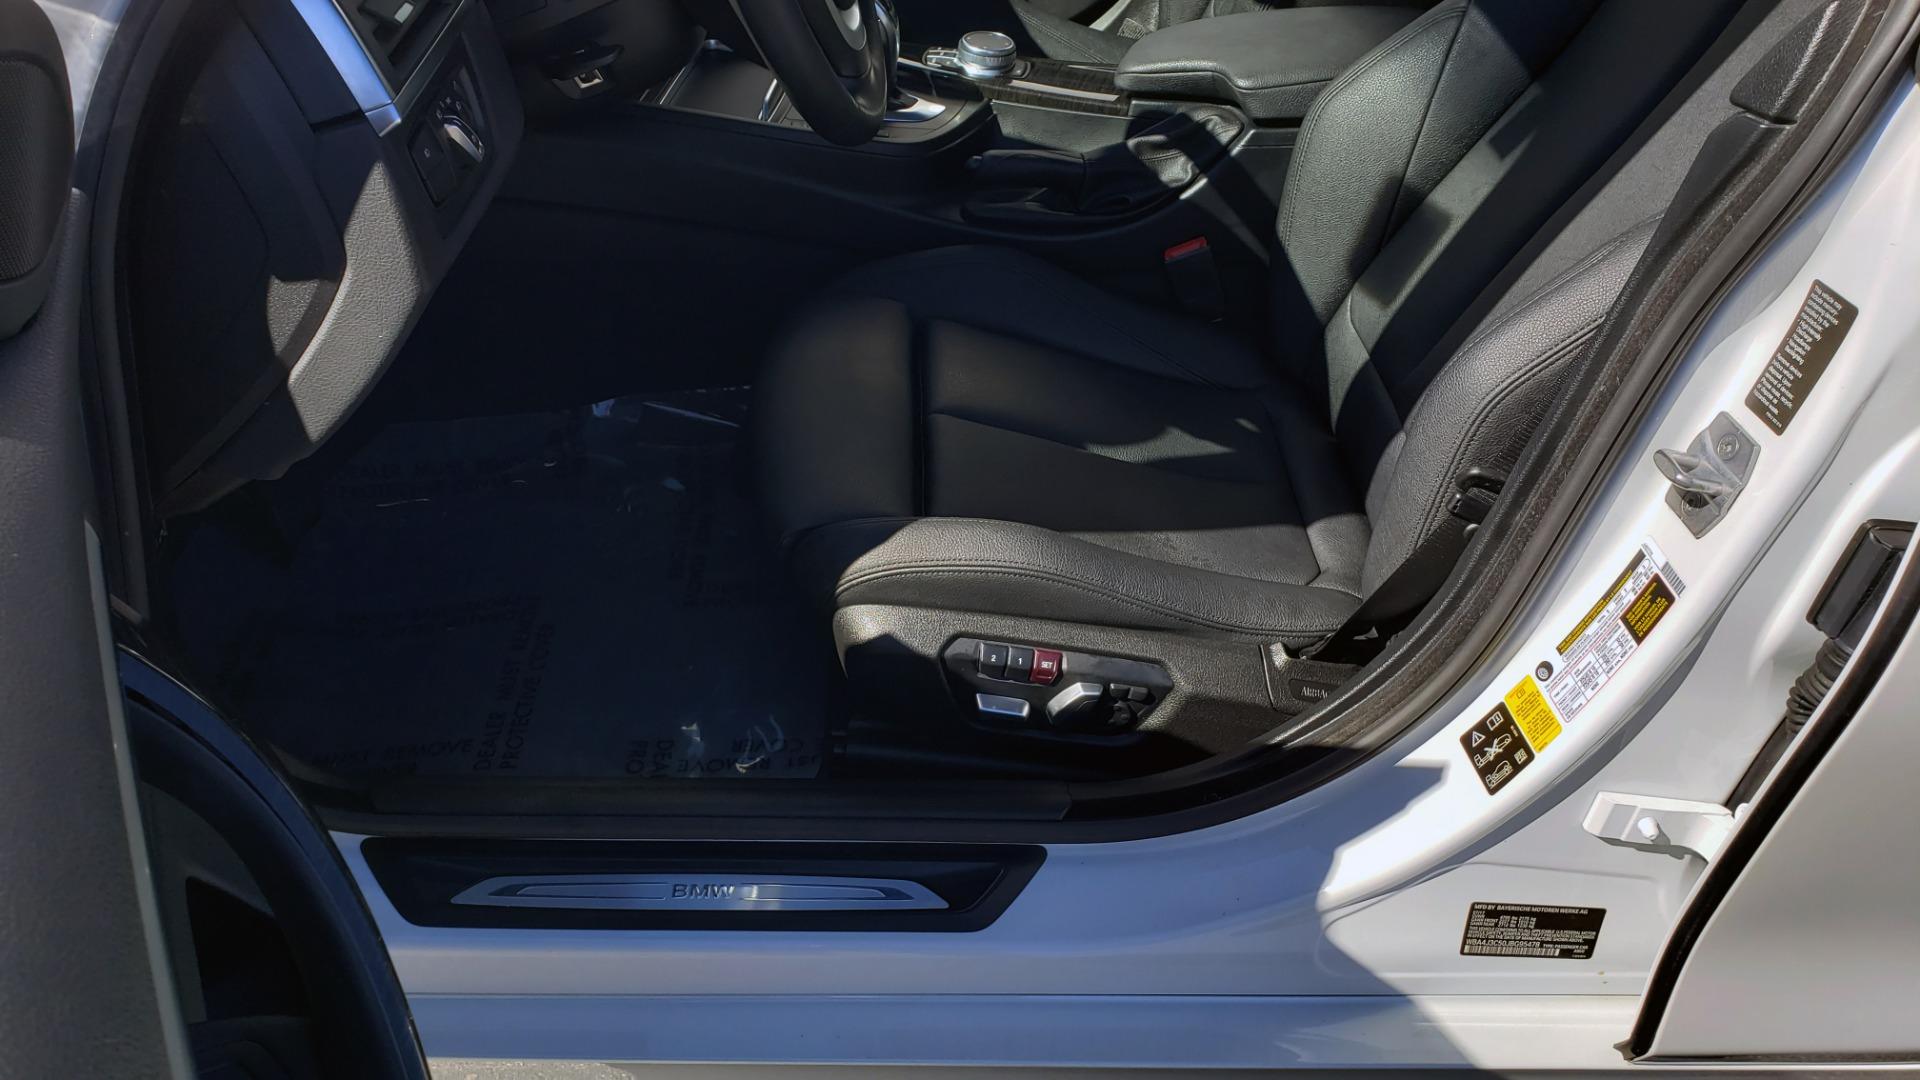 Used 2018 BMW 4 SERIES 430IXDRIVE / PREMIUM / NAV / SUNROOF / ESSENTIALS PKG for sale $27,795 at Formula Imports in Charlotte NC 28227 33